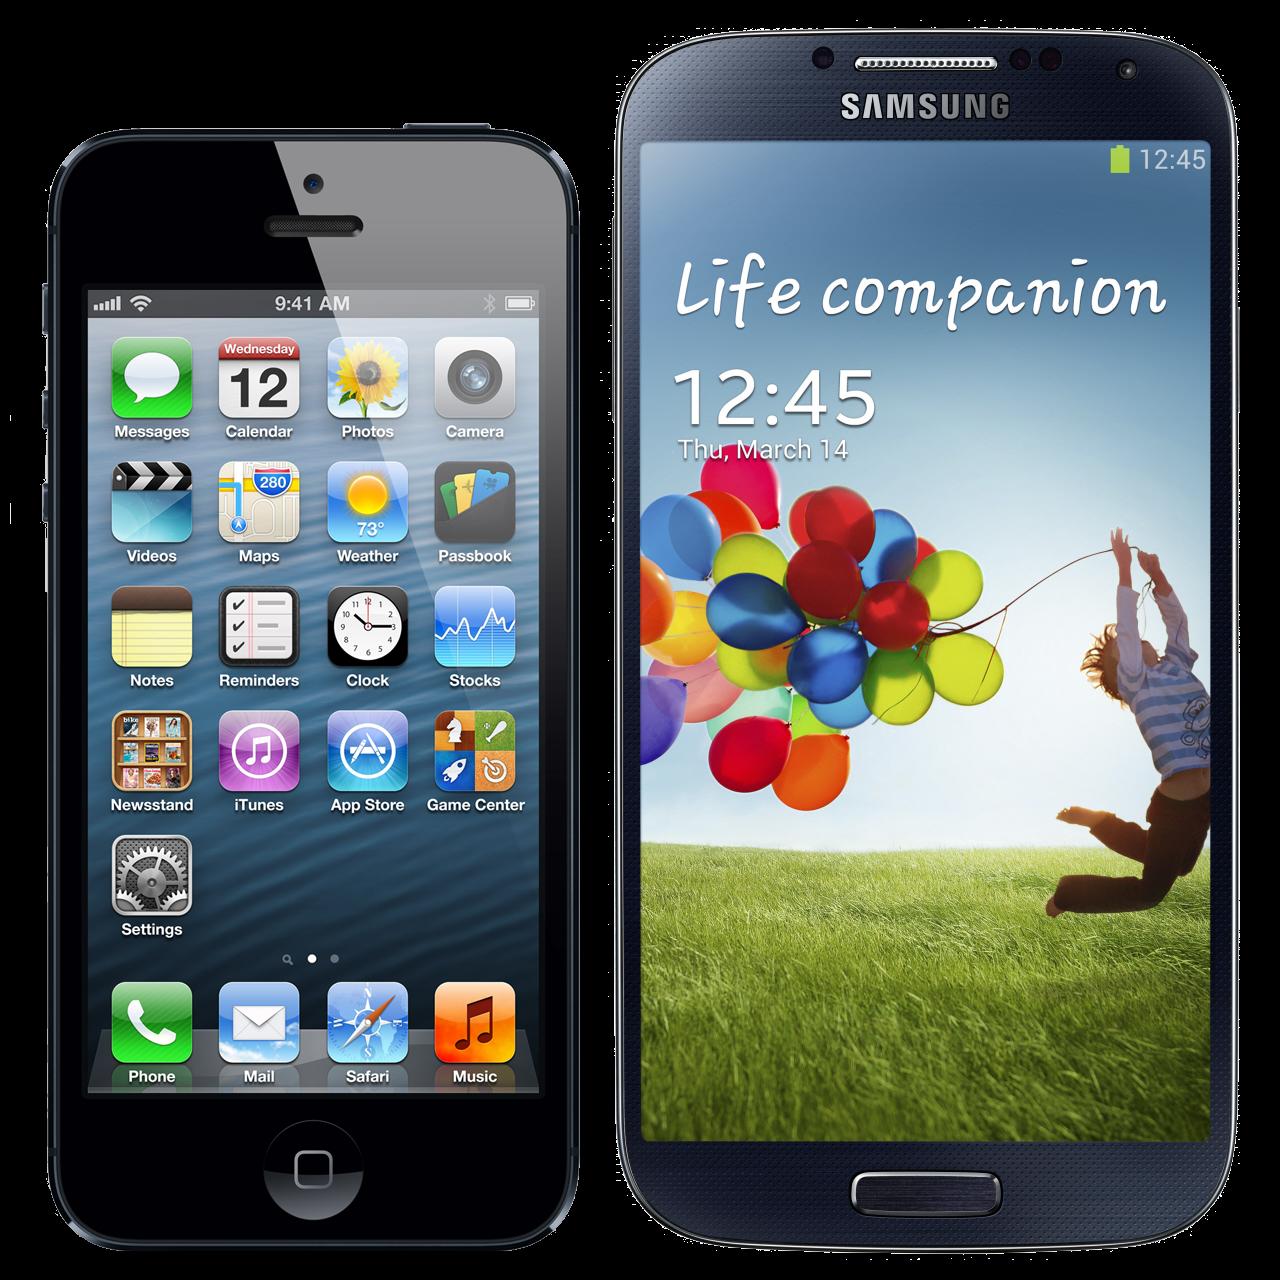 galaxy-s4-protiv-iphone-5-mnenie-analitikov-